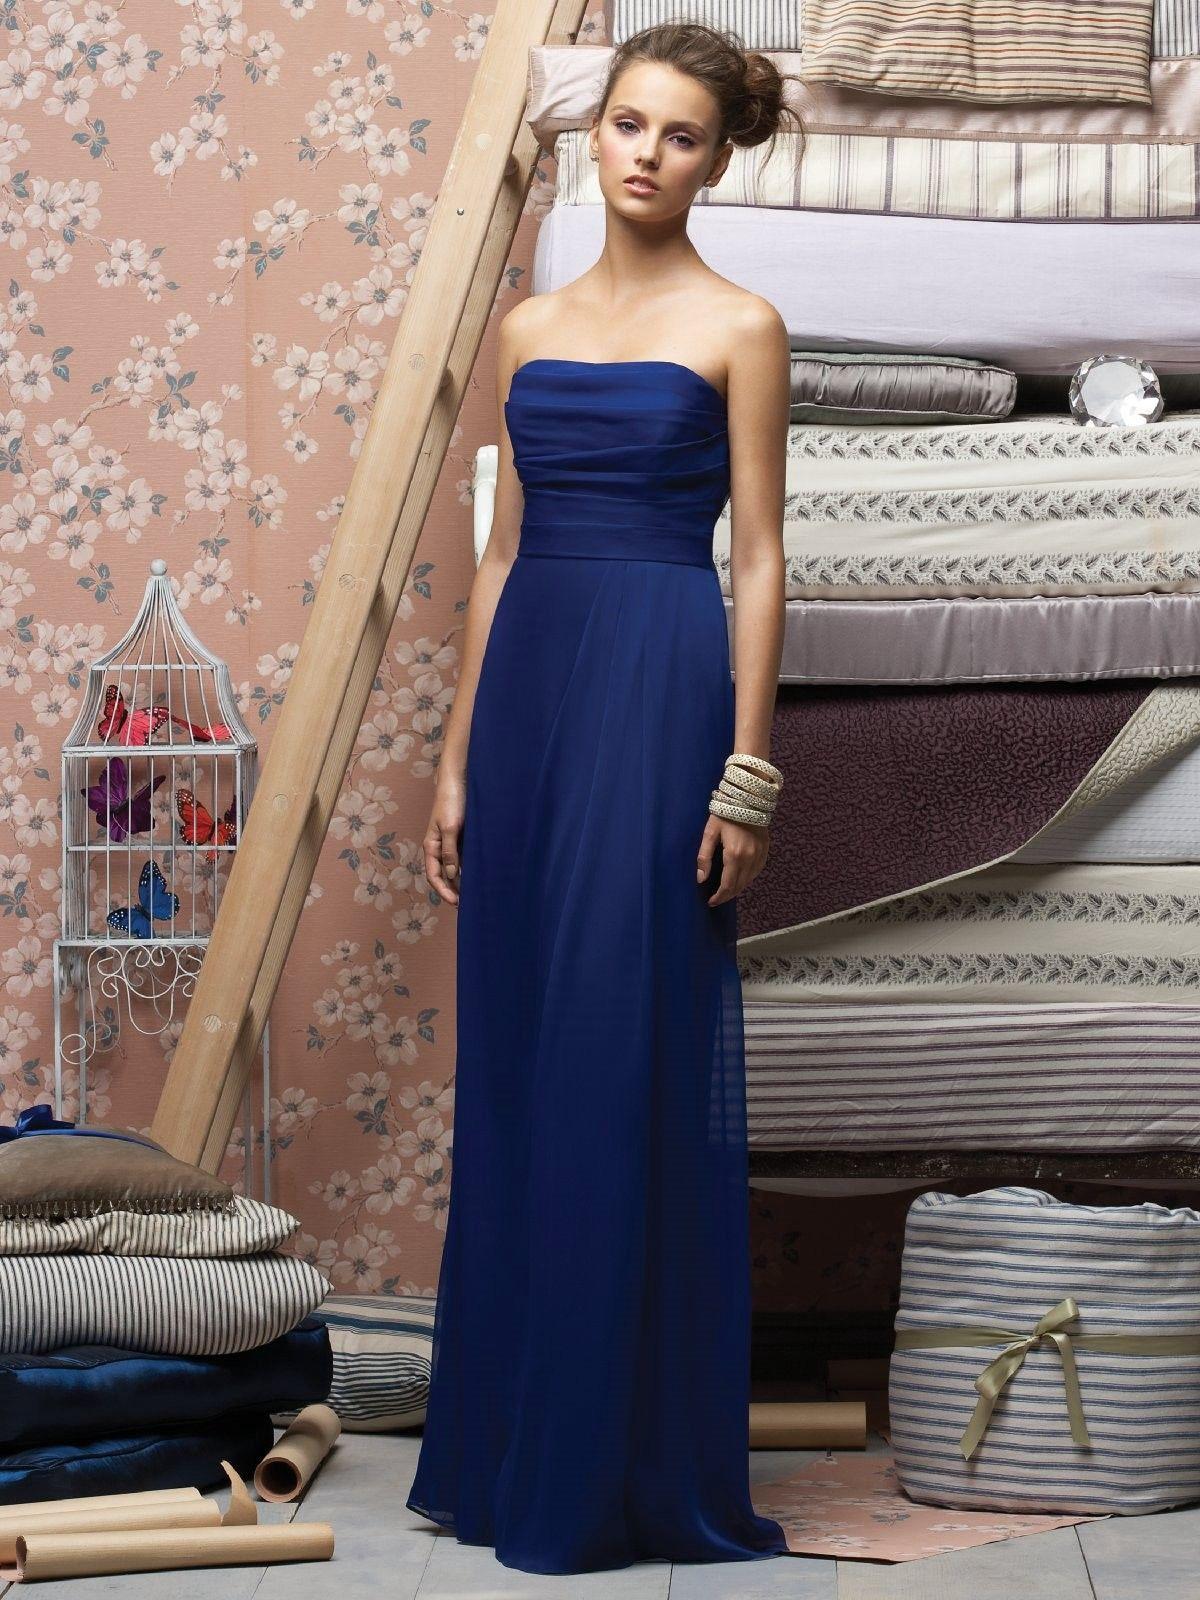 Chiffon Strapless Pleated bodic Formal Long Dress